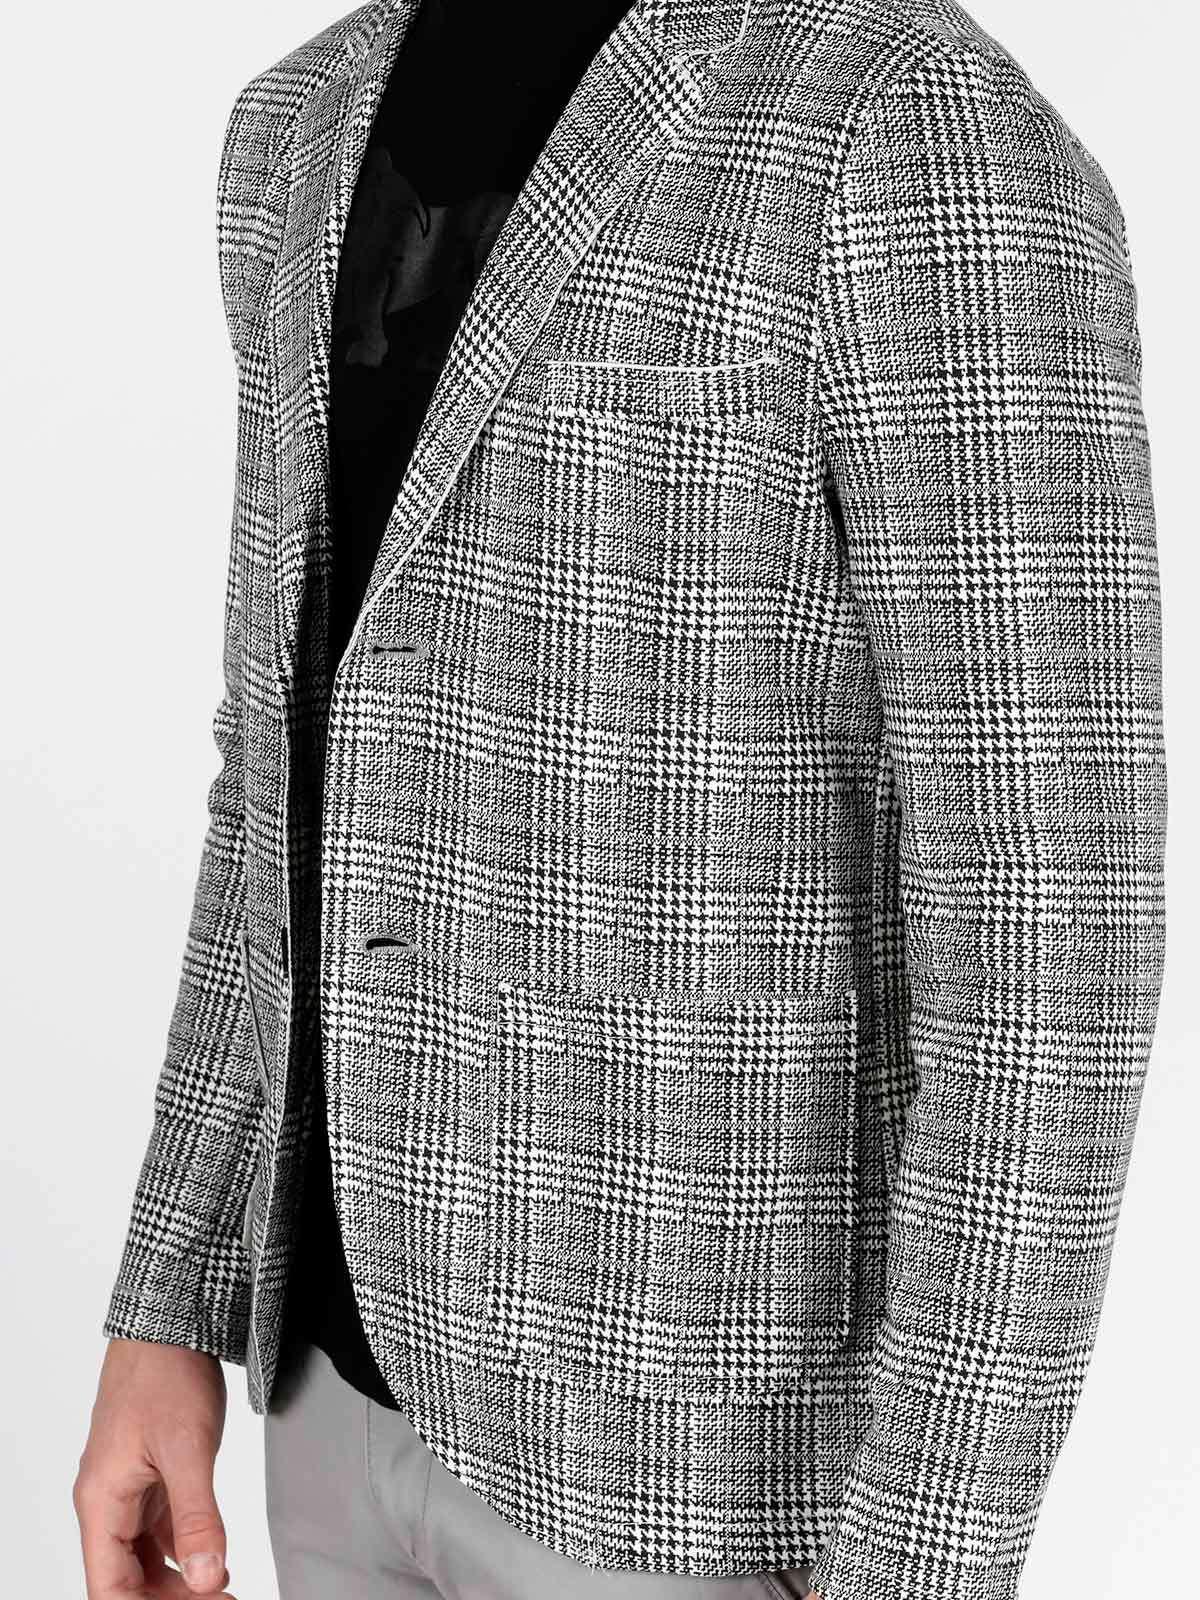 reputable site cc516 24740 Giacca principe di galles ange wear | MecShopping